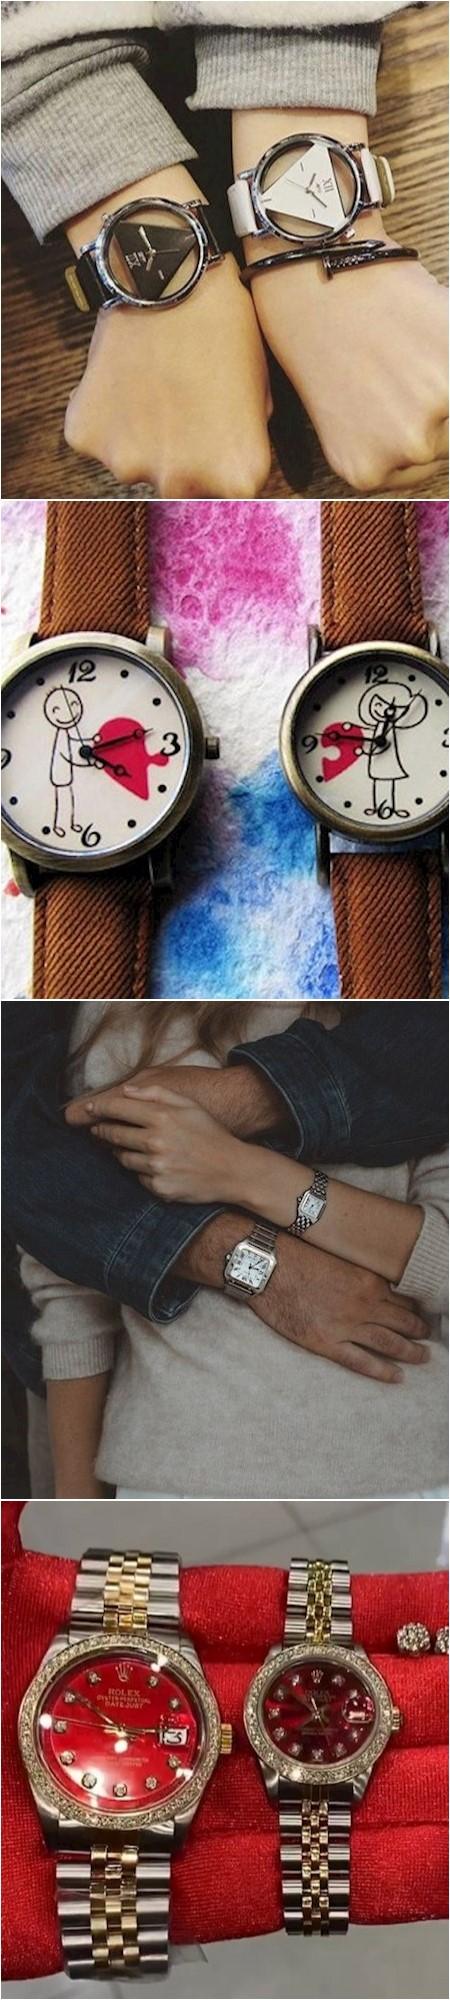 couple watch set 12 عکسهای زیبا از ست ساعت دونفره